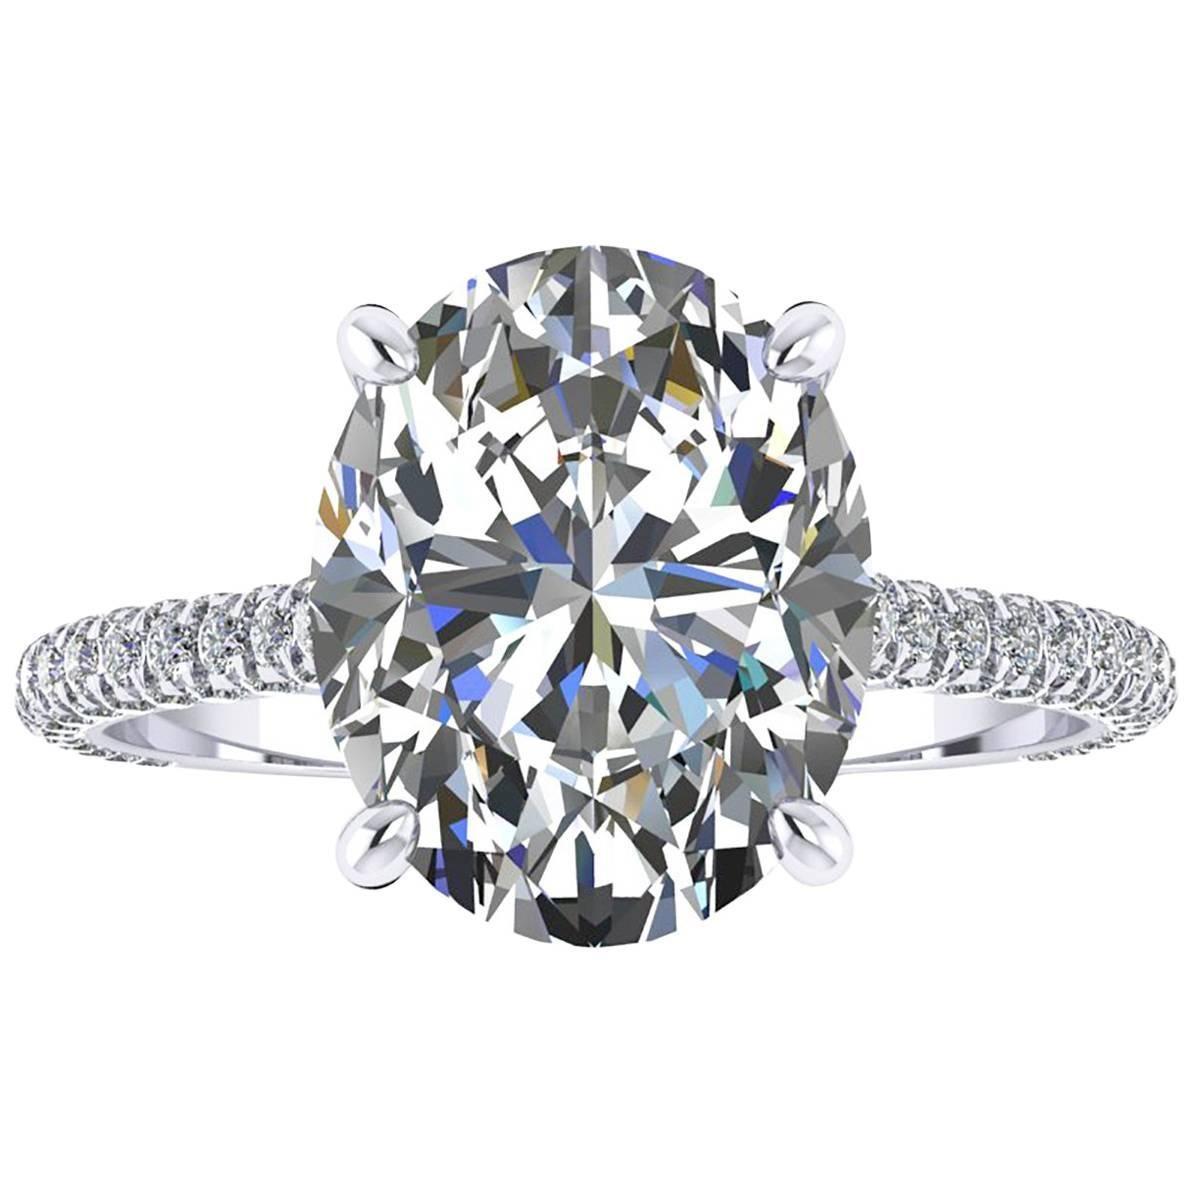 GIA Certified 2.52 Carat Oval Cut Diamond Platinum 950 engagement ring